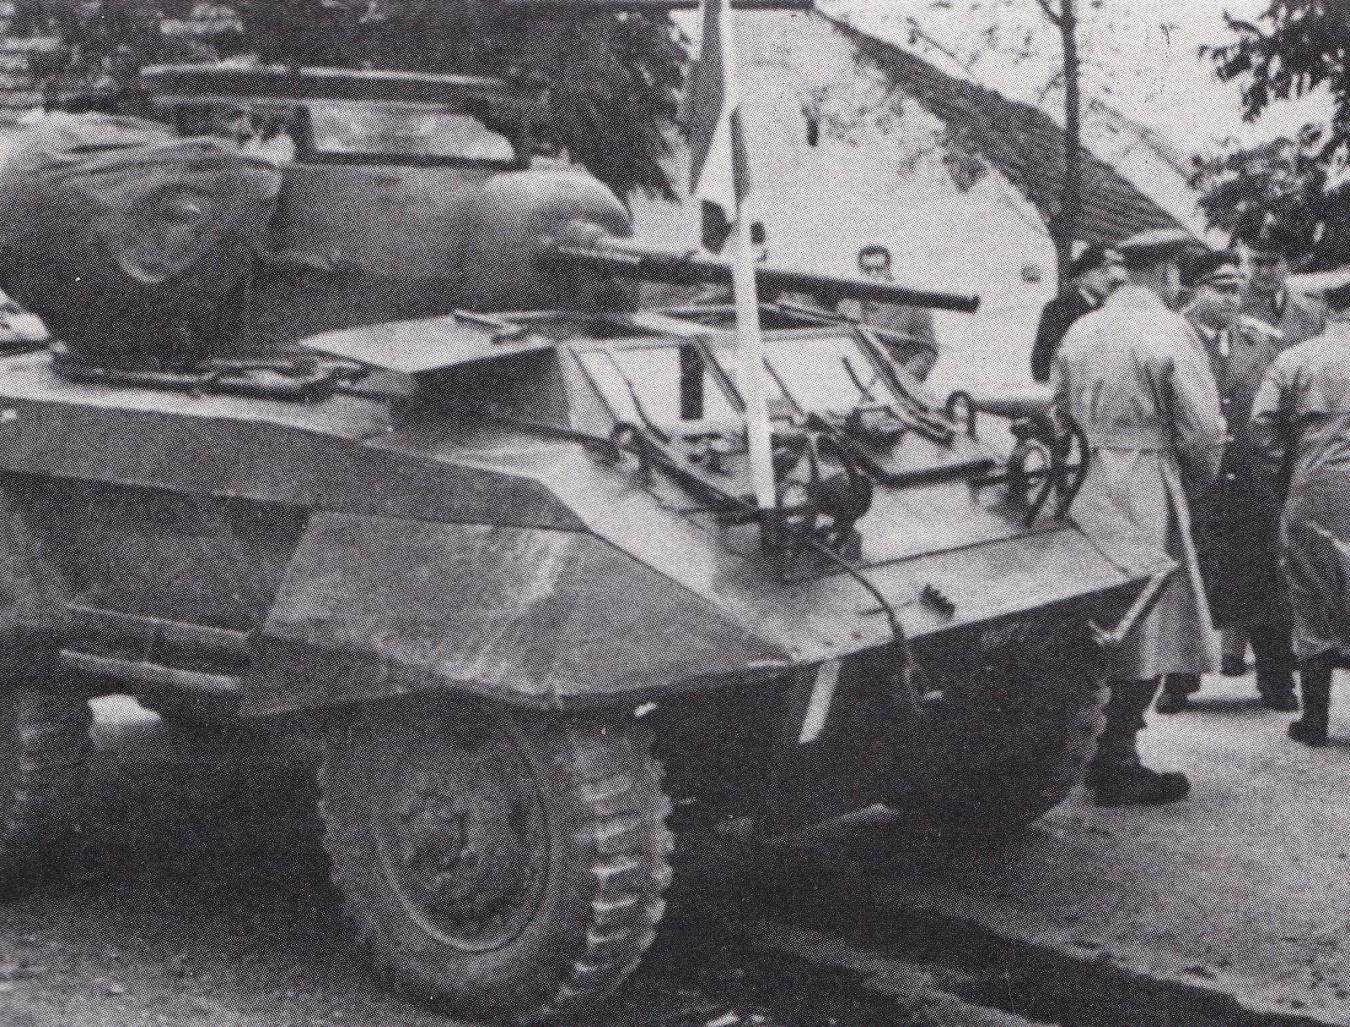 D:\Archiv Nemeth\Fzg-Gerät-Ausrüstung\Fahrzeuge\Mehrspurige Kfz\BH Fahrzeuge\M8\Ungarn 1956\Ungarn 1.jpg